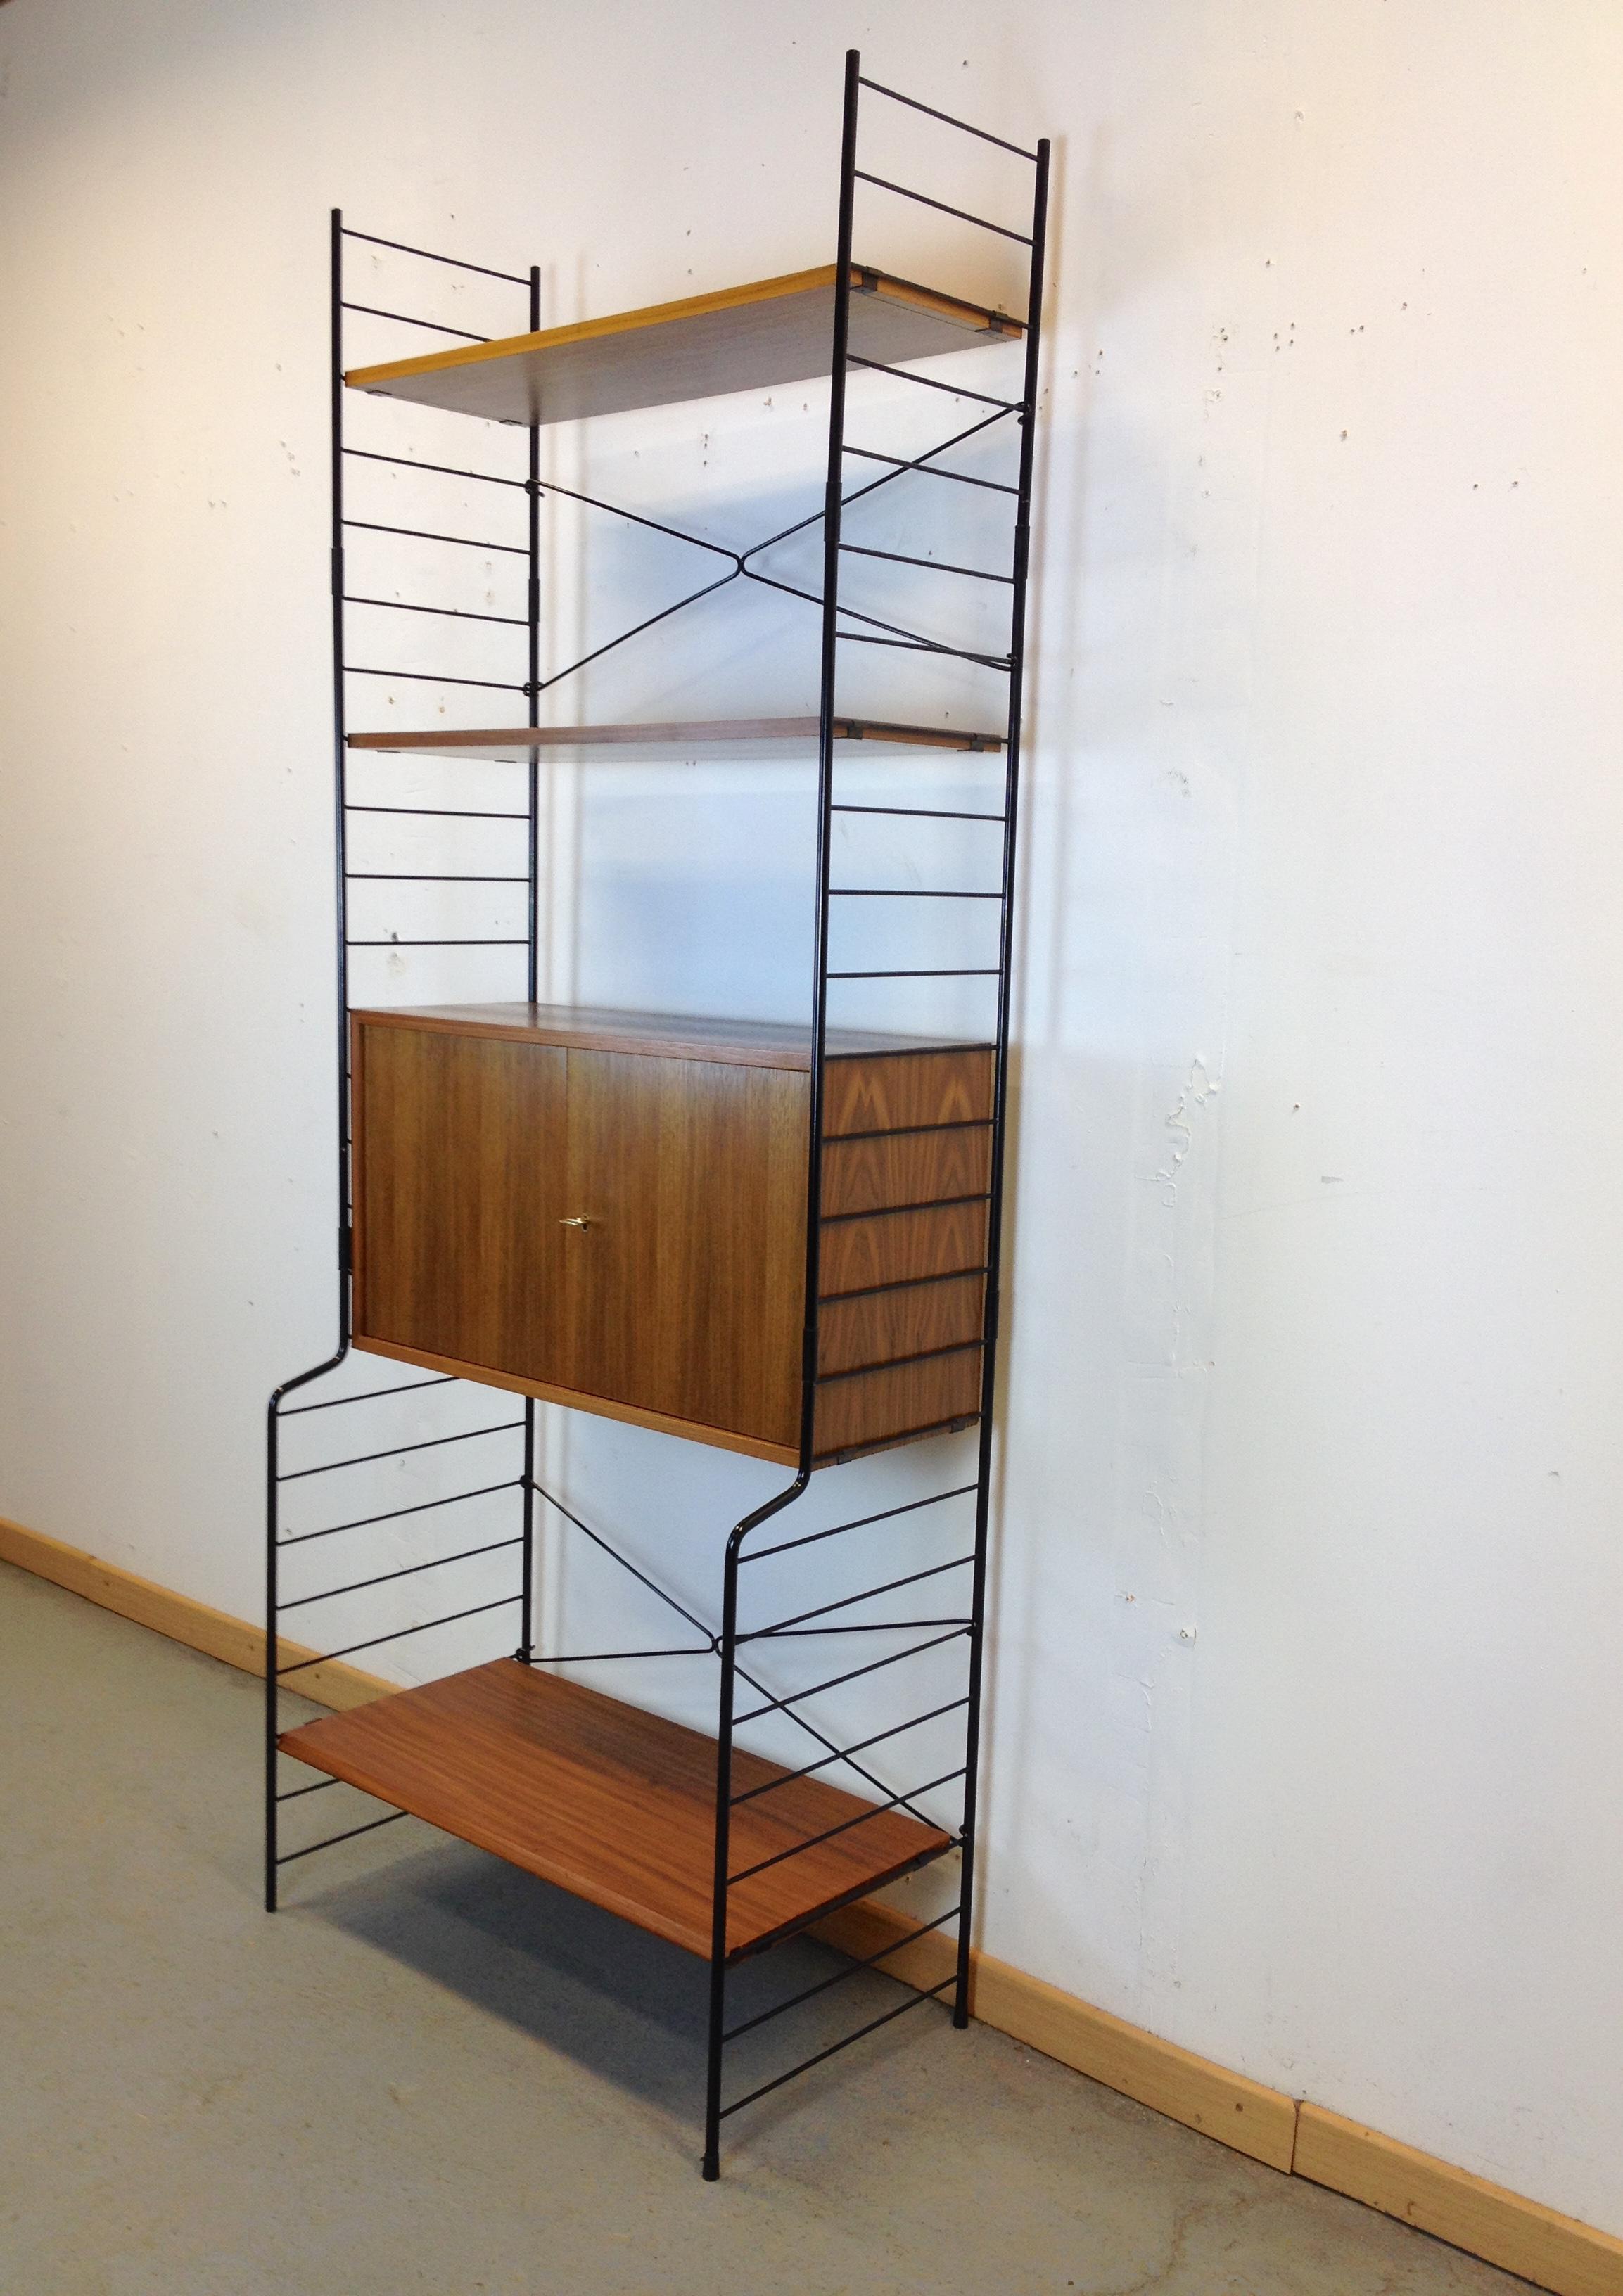 etag re biblioth que modulable scandinave string regal ann e 60. Black Bedroom Furniture Sets. Home Design Ideas